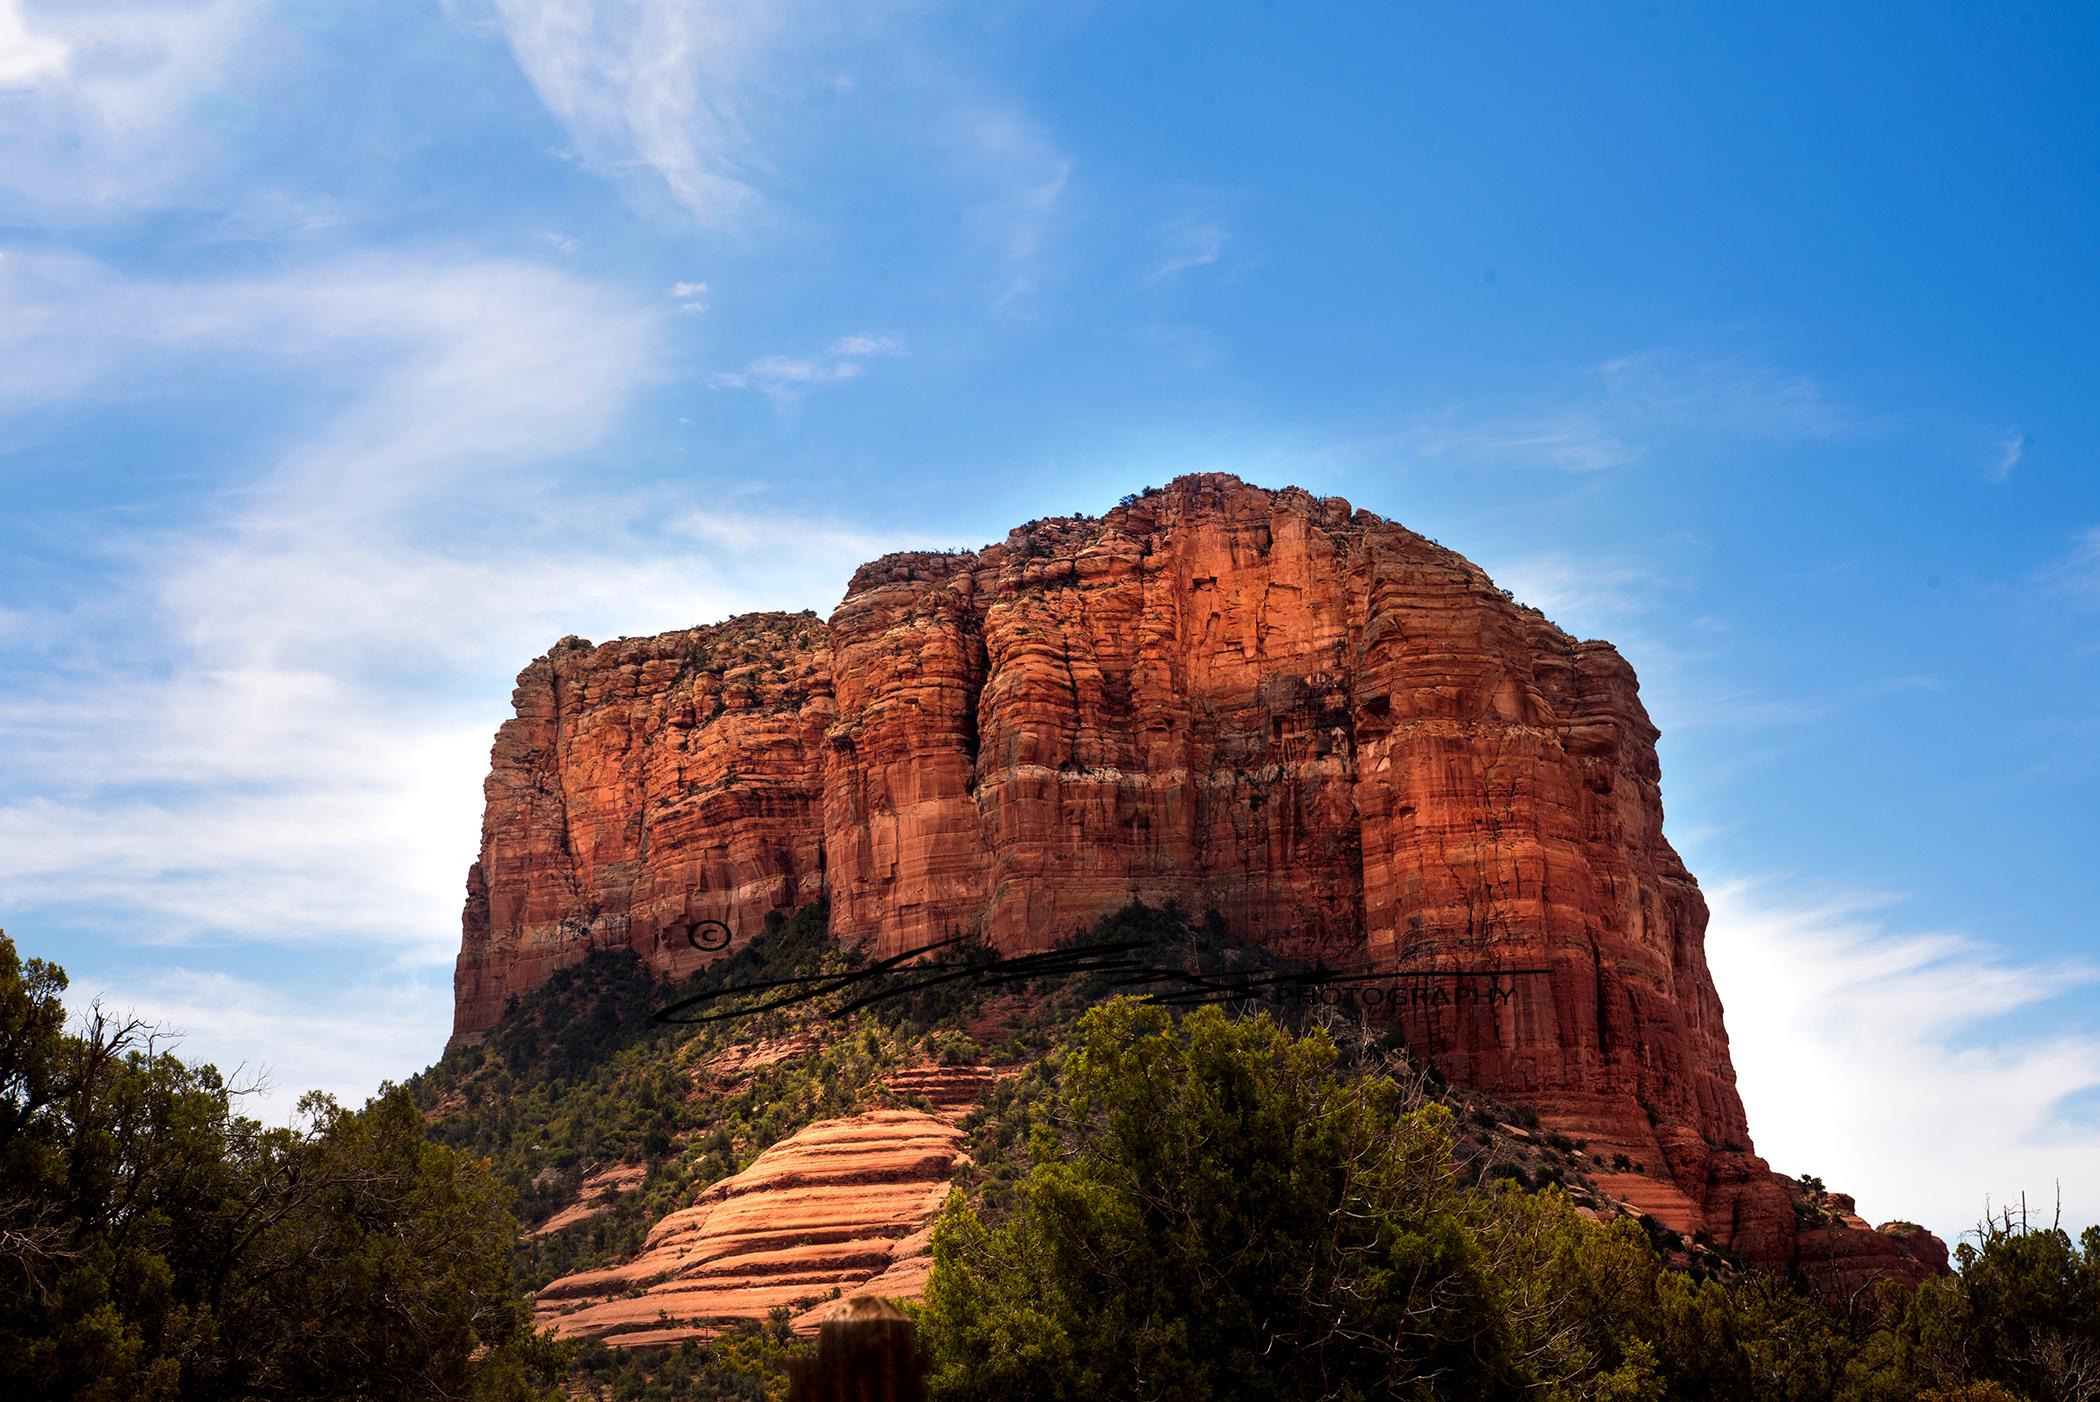 Sedona_Scenecroute_Arizona_Bellrock_travelphotography_jbogerphotography (1).jpg